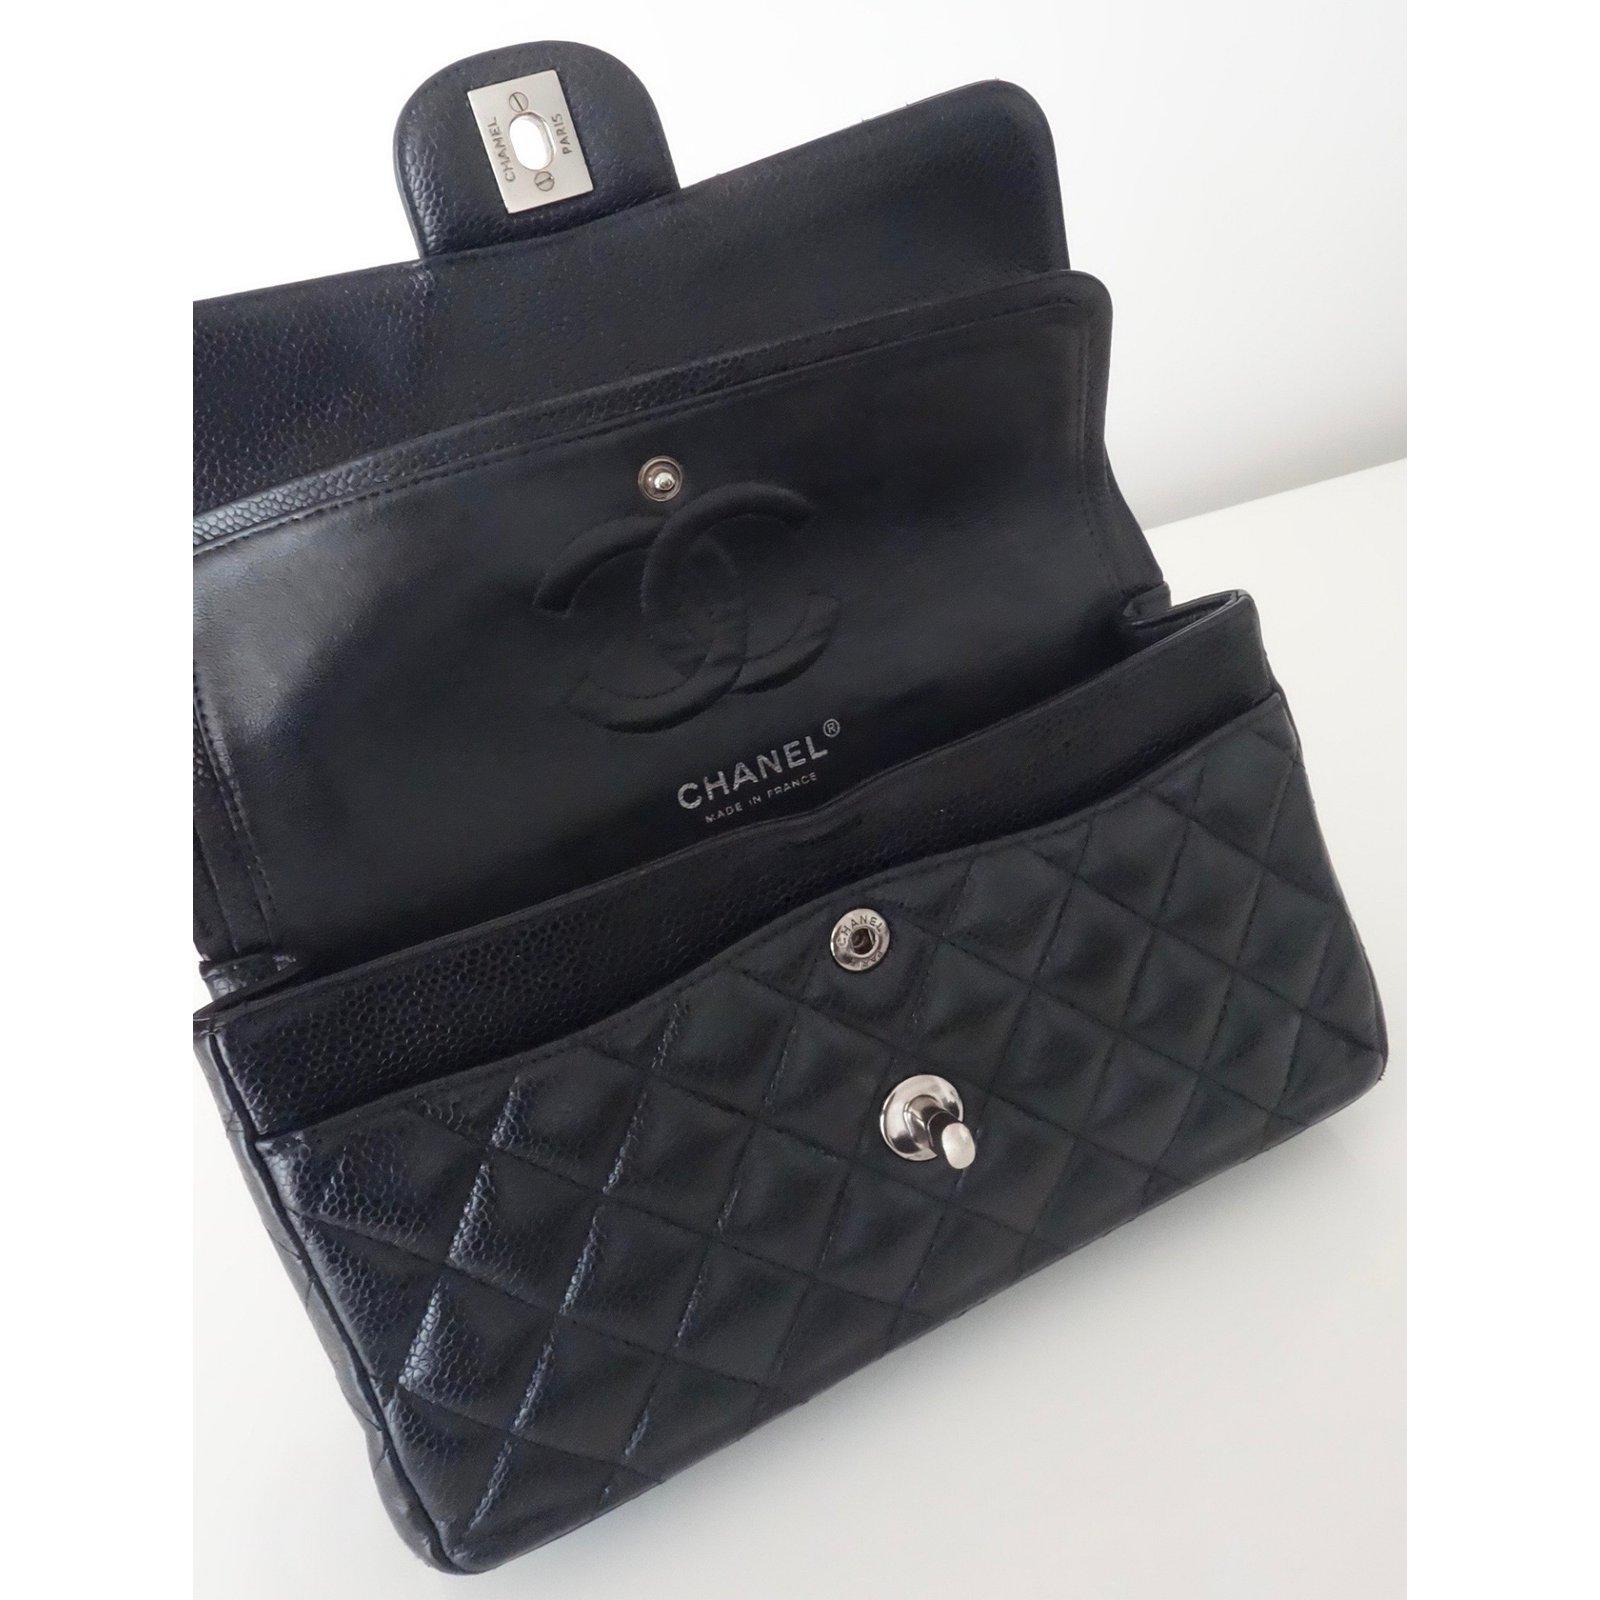 8477266856b9 Chanel CLASSIC CHANEL BAG Handbags Leather Black ref.105060 - Joli Closet